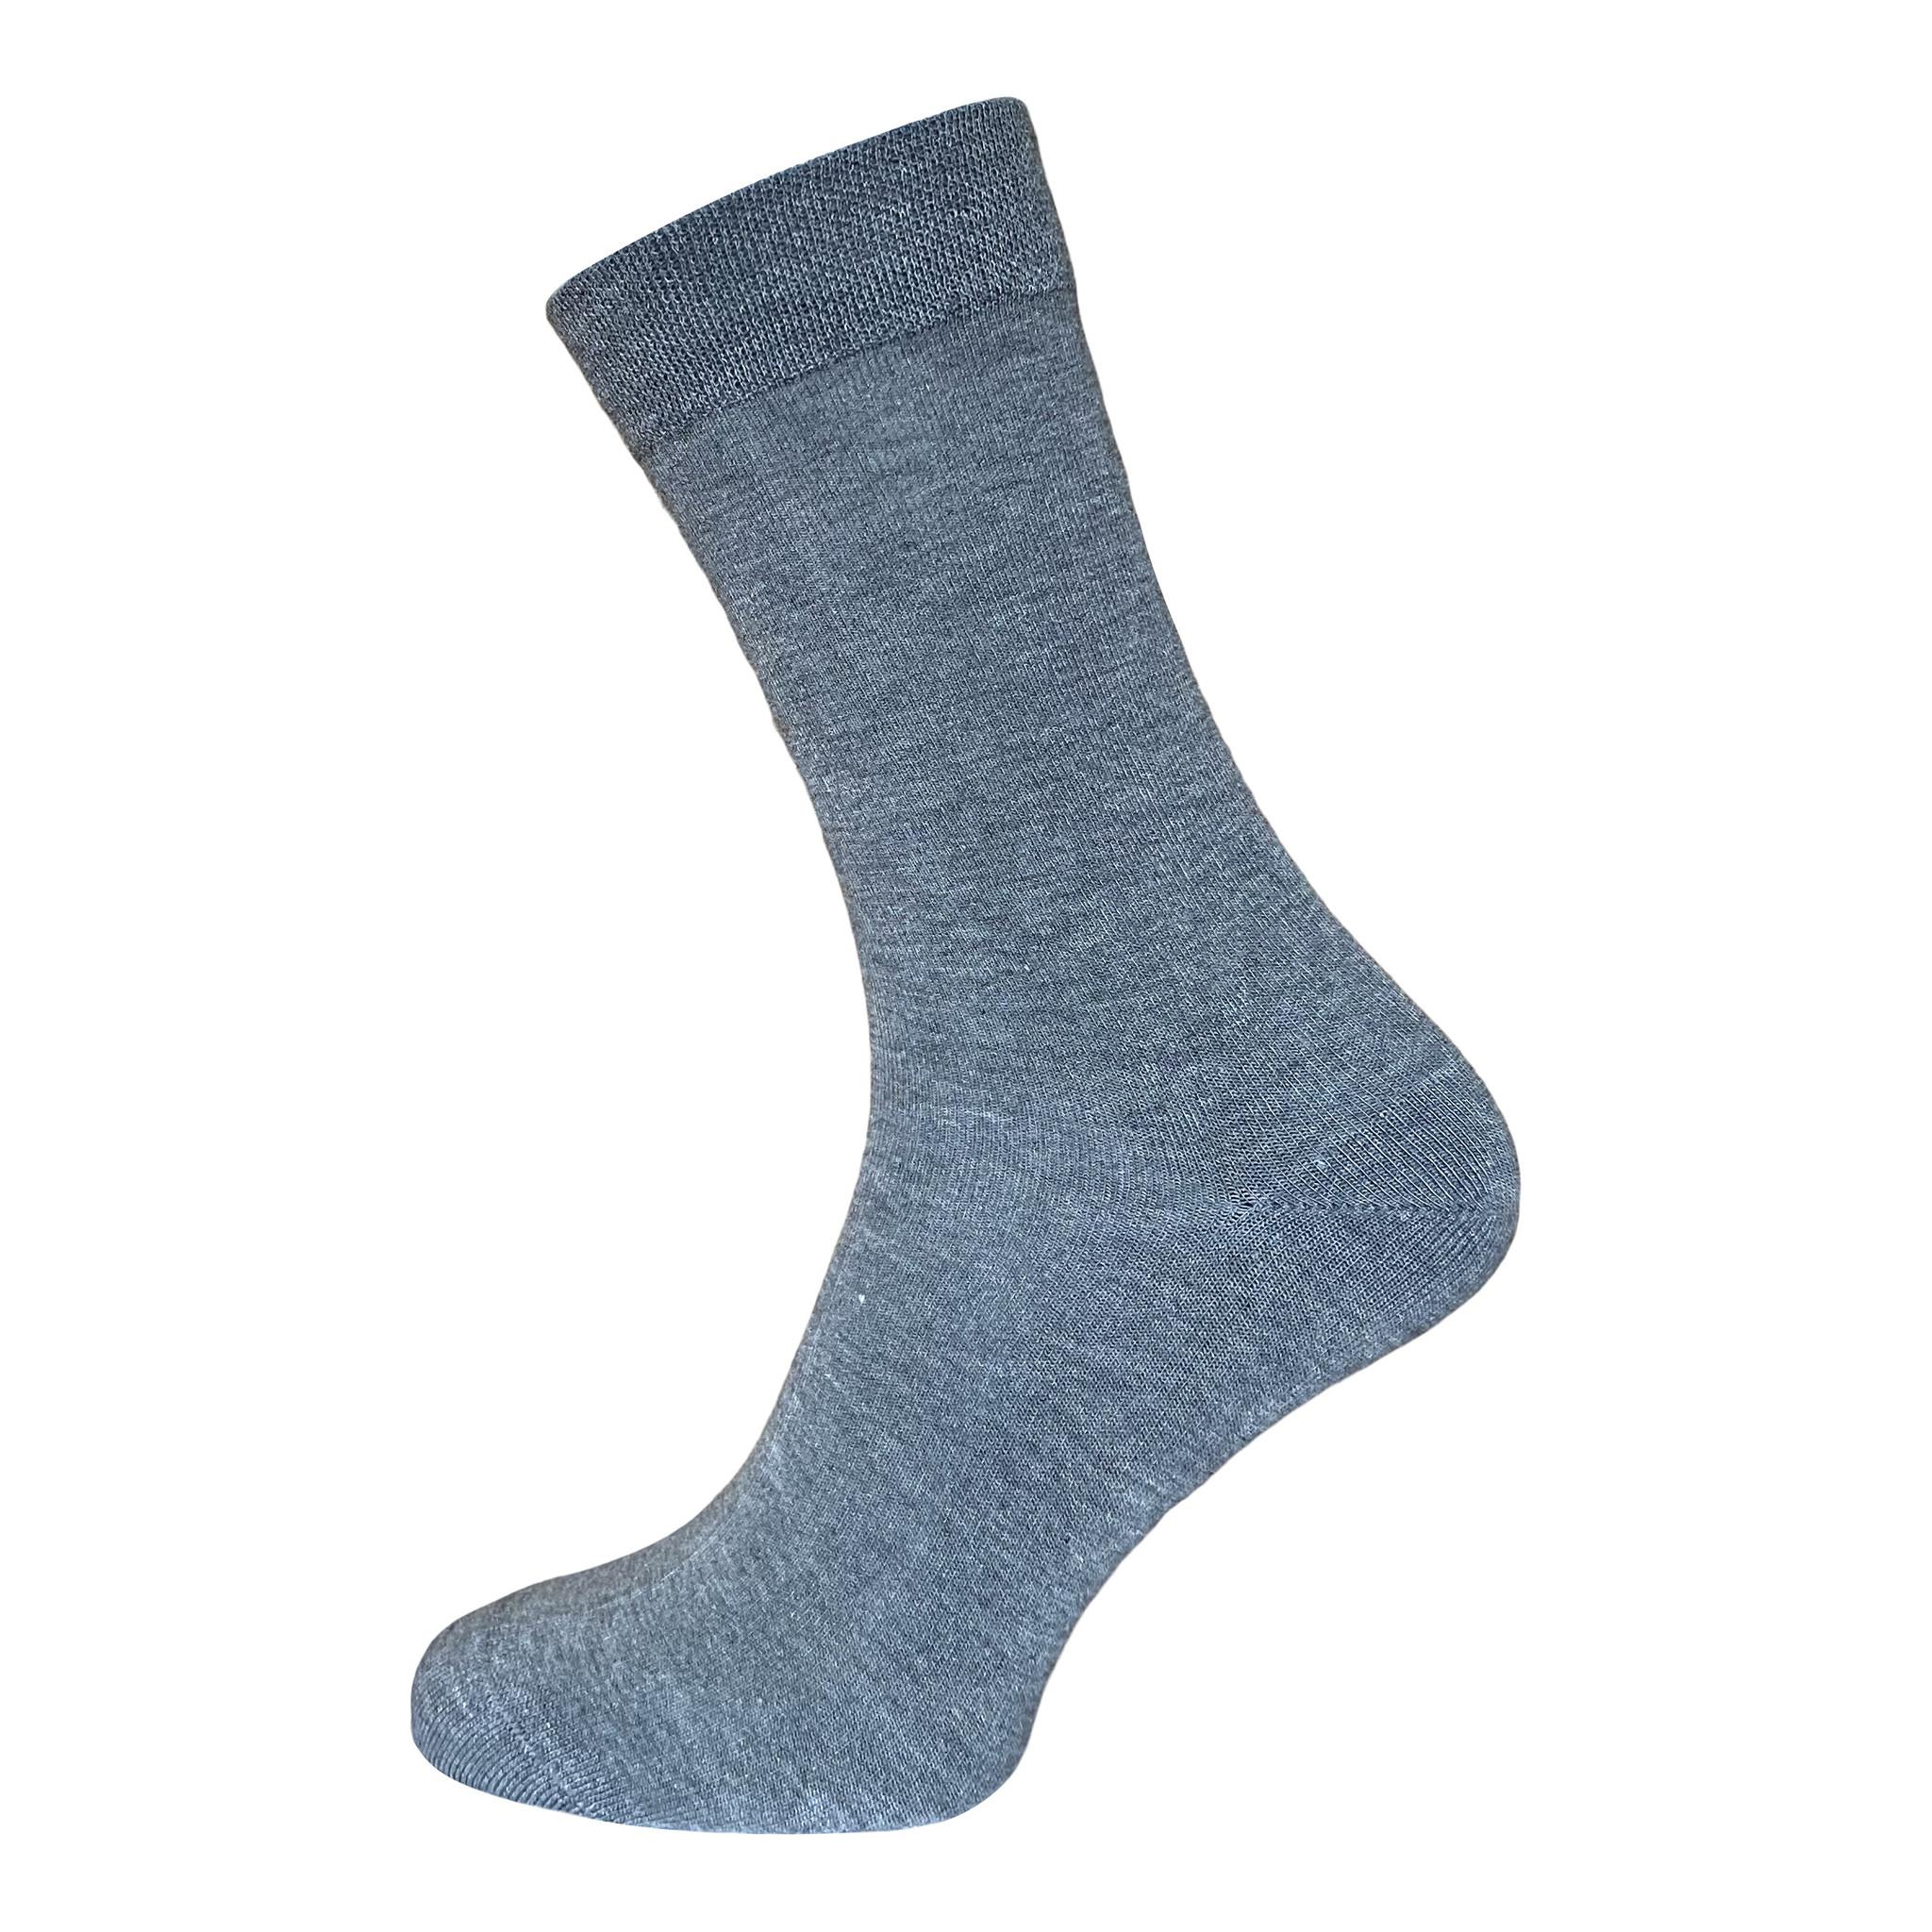 BORU Boru Bamboe sokken - middengrijs